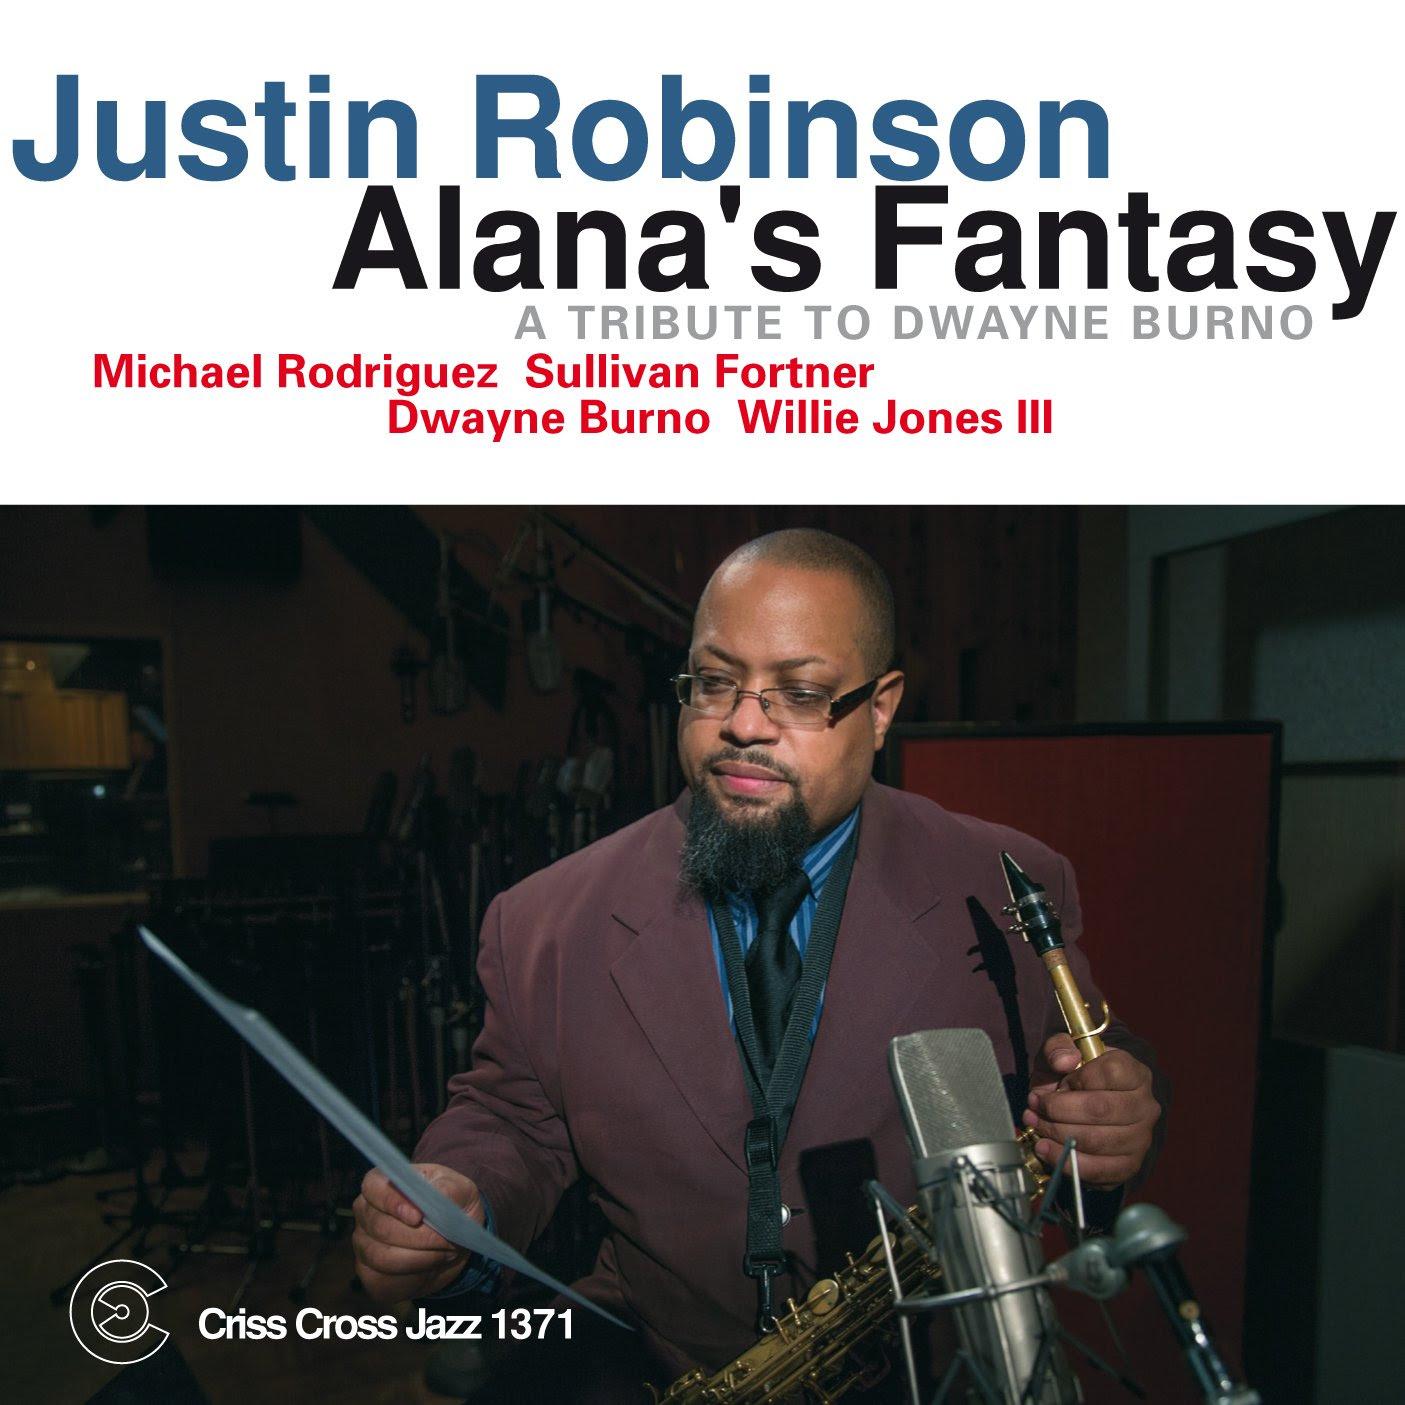 Justin Robinson - Alana's Fantasy  cover